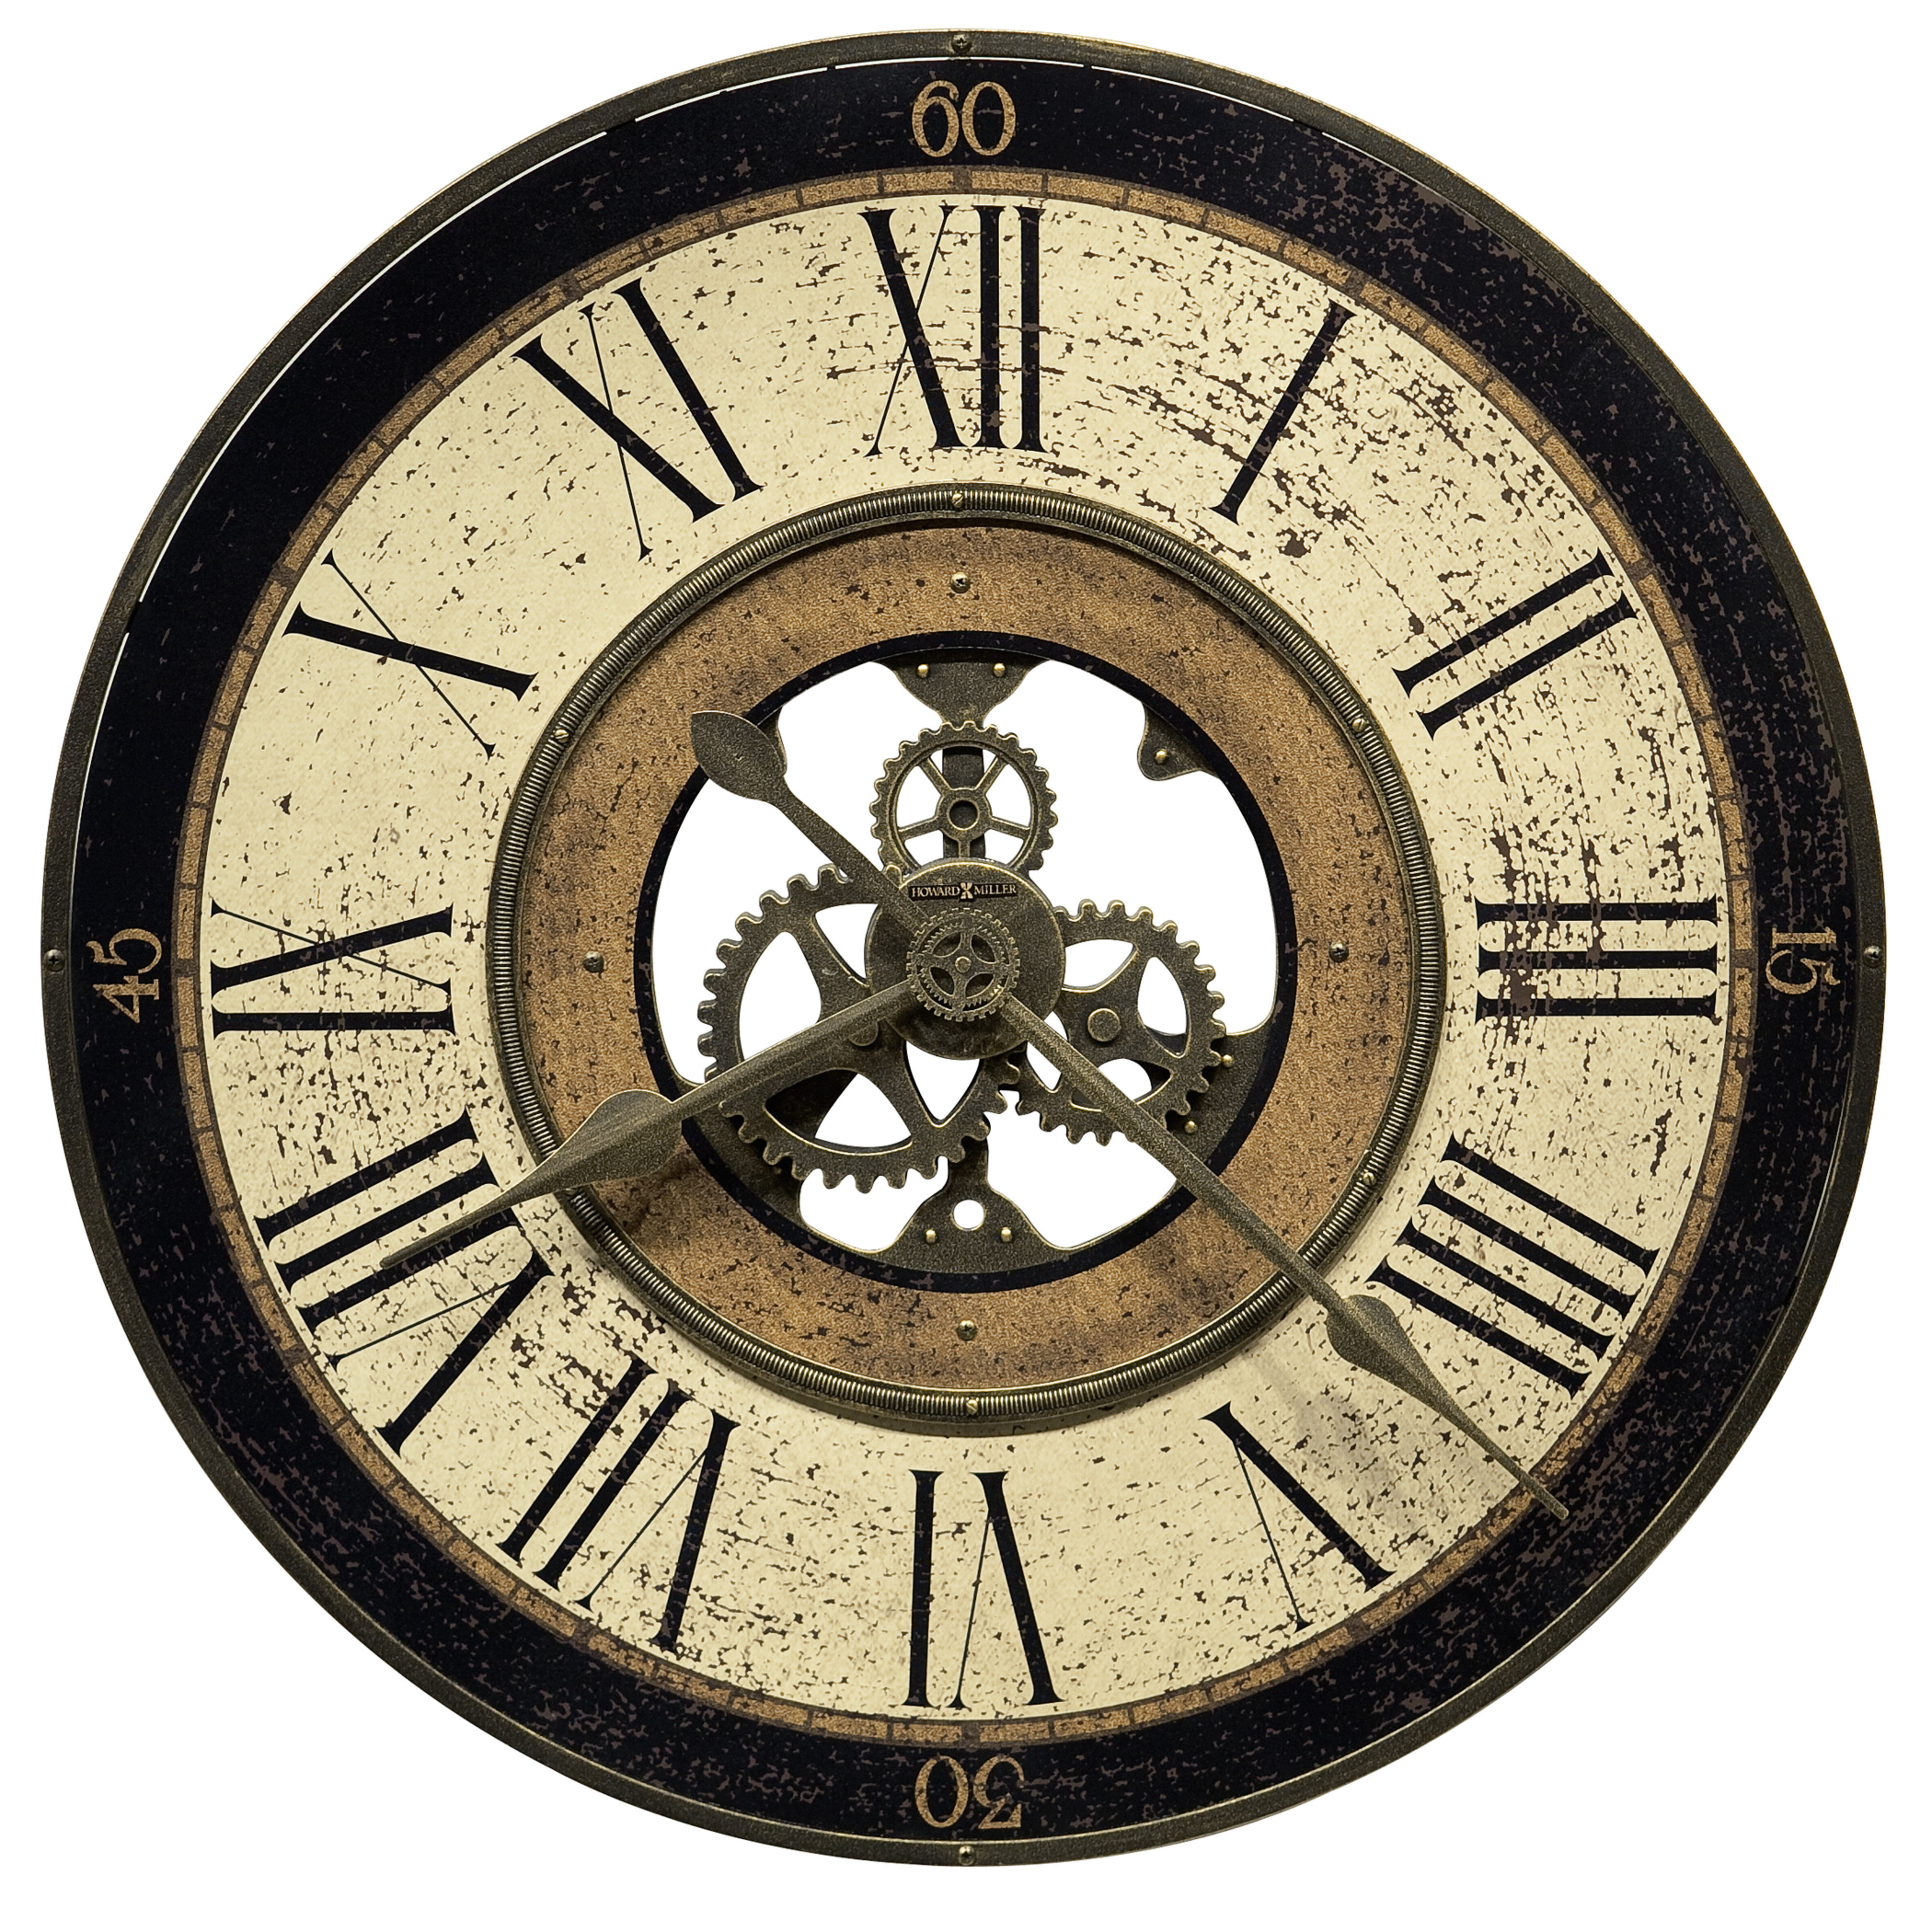 Brass Industrial Wall Clocks You Ll Love In 2021 Wayfair